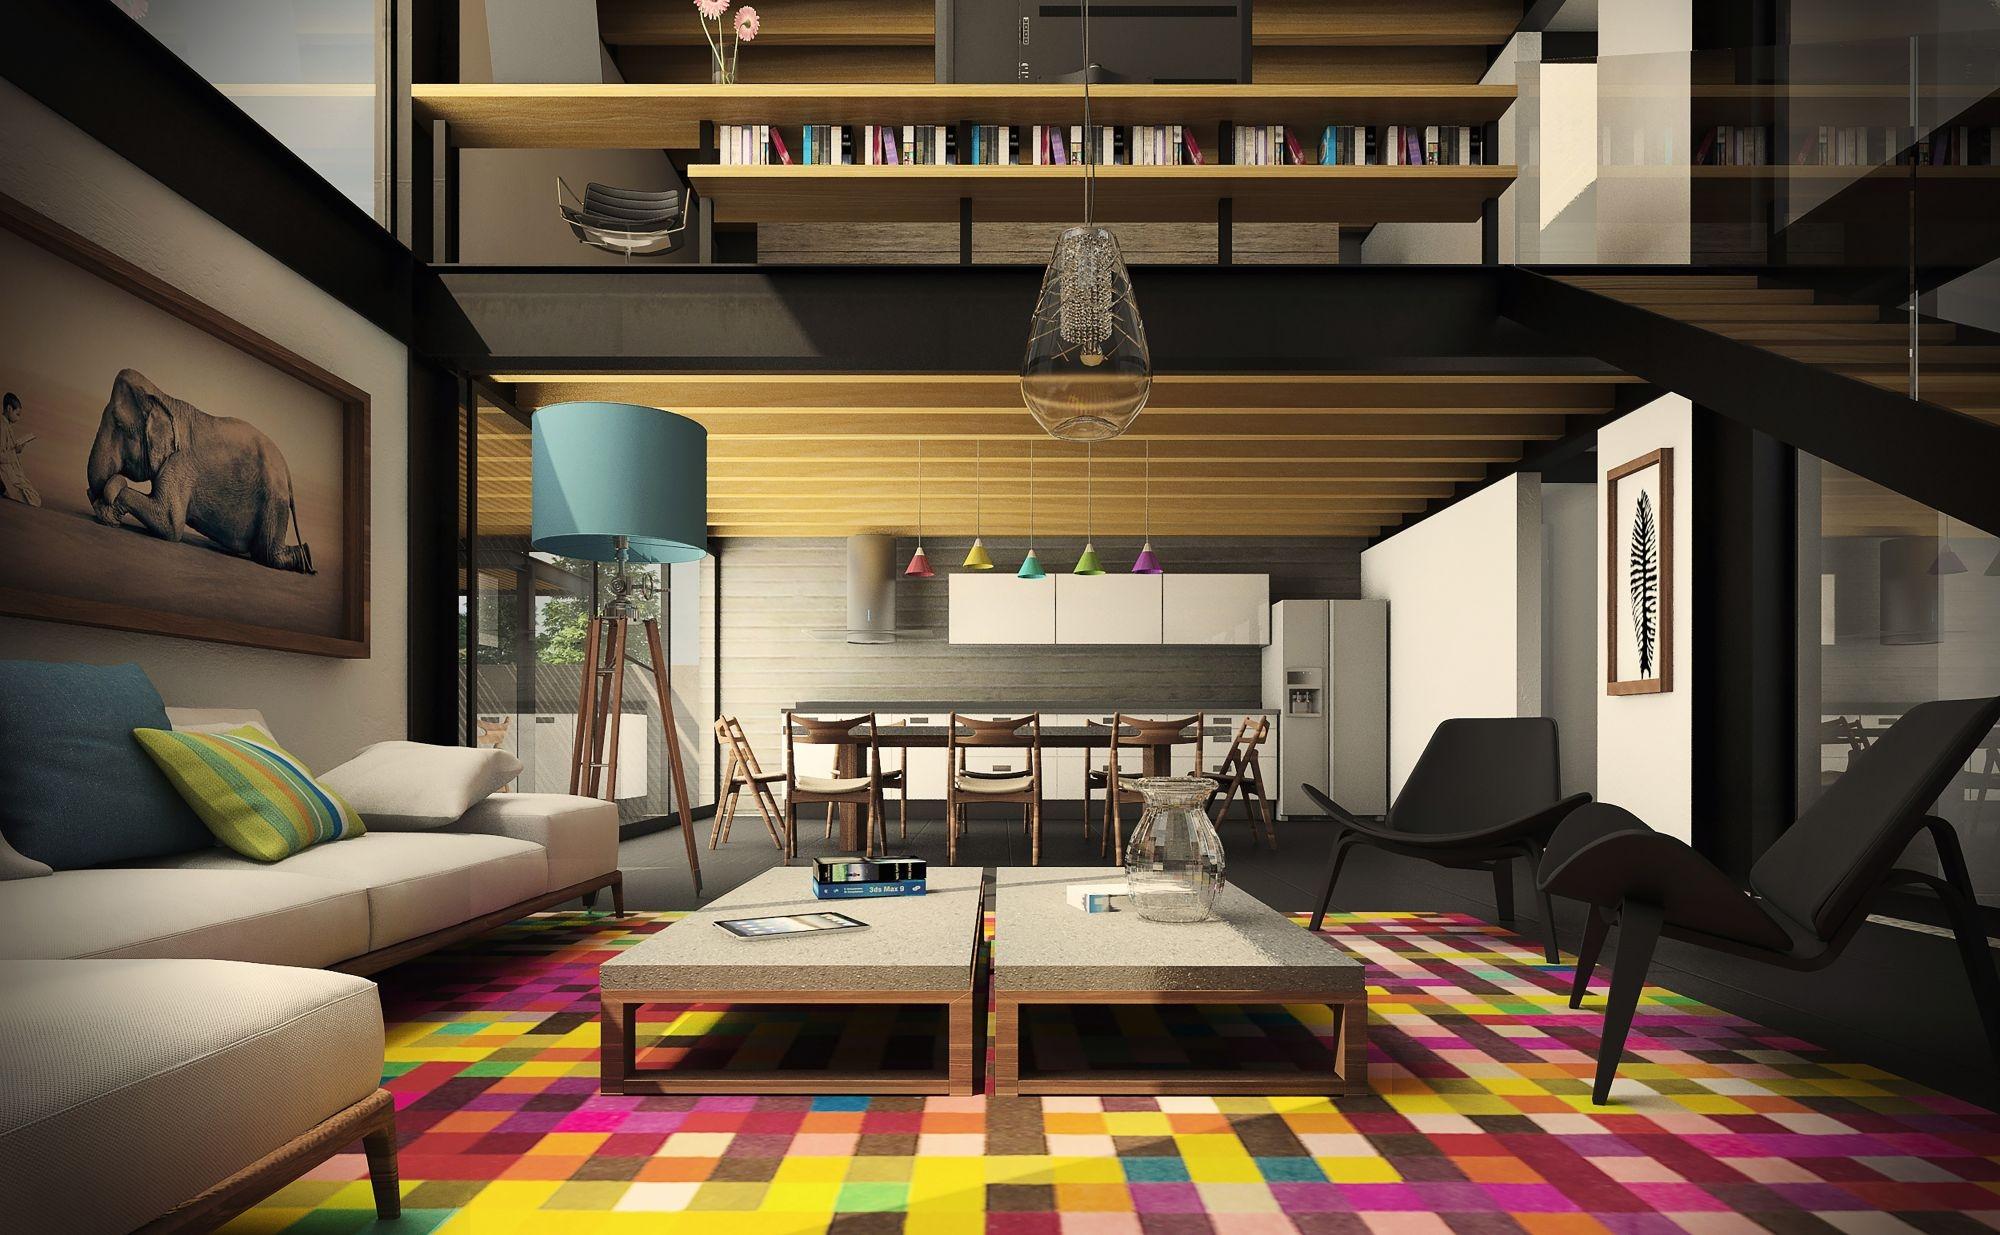 captivating living room ideas modern.  Beautiful Captivating Living Room Design Ideas FresHOUZ com